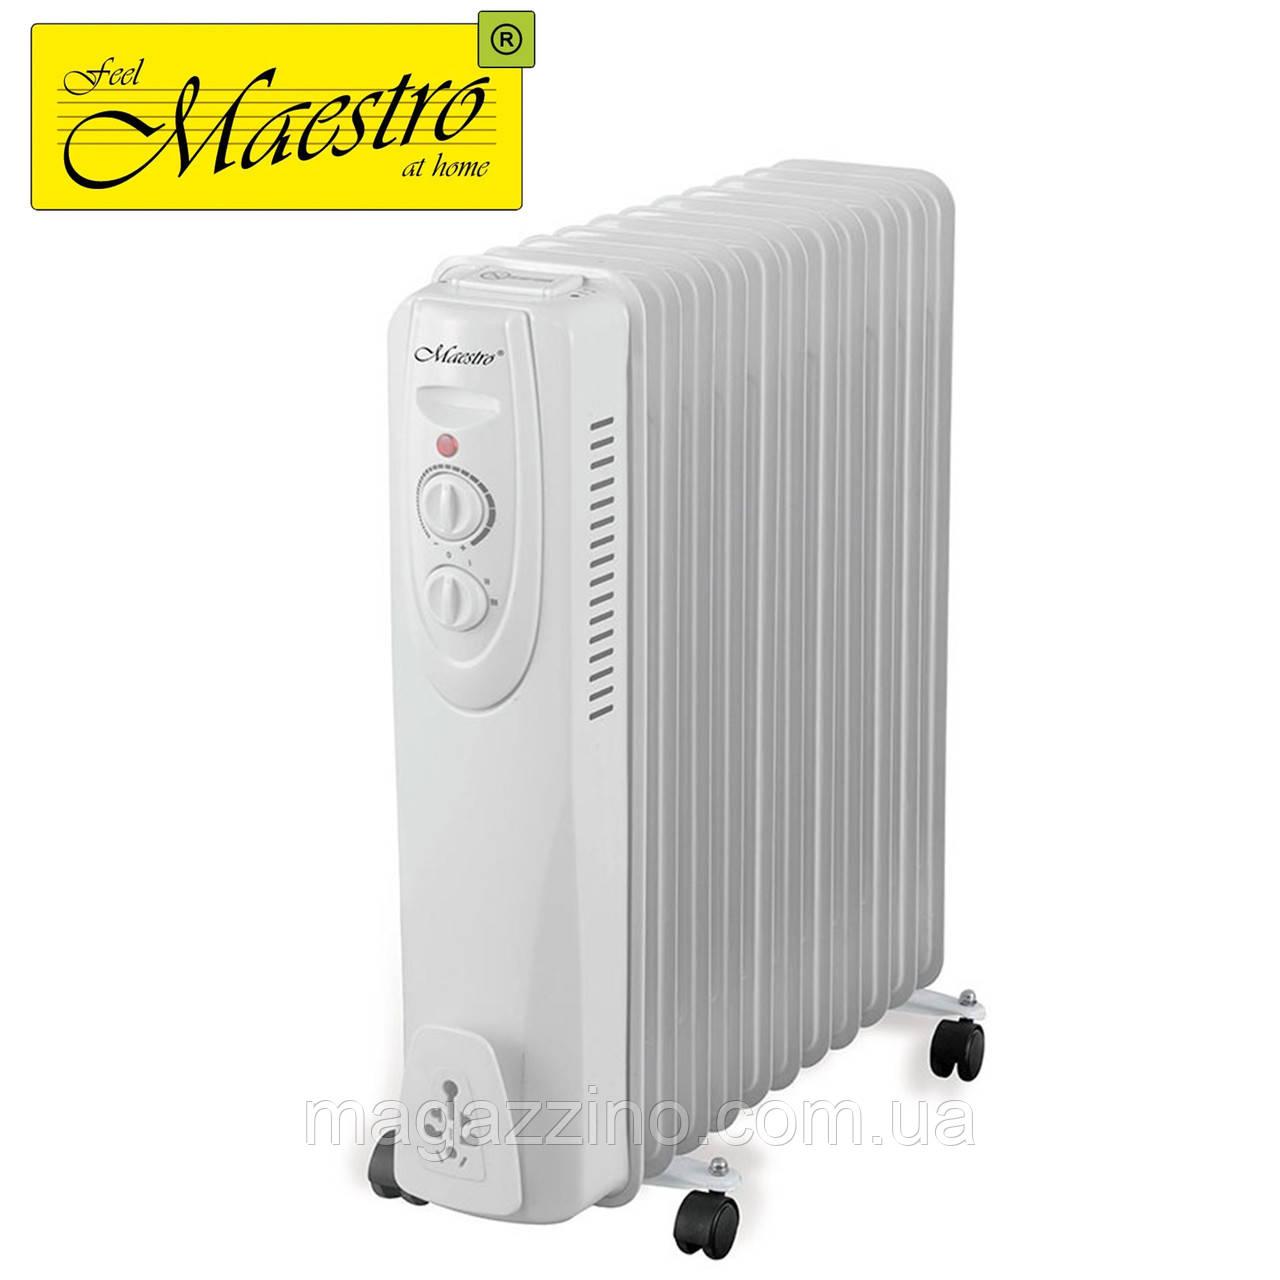 Масляний радіатор Maestro MR-950-11, 2500 Вт.